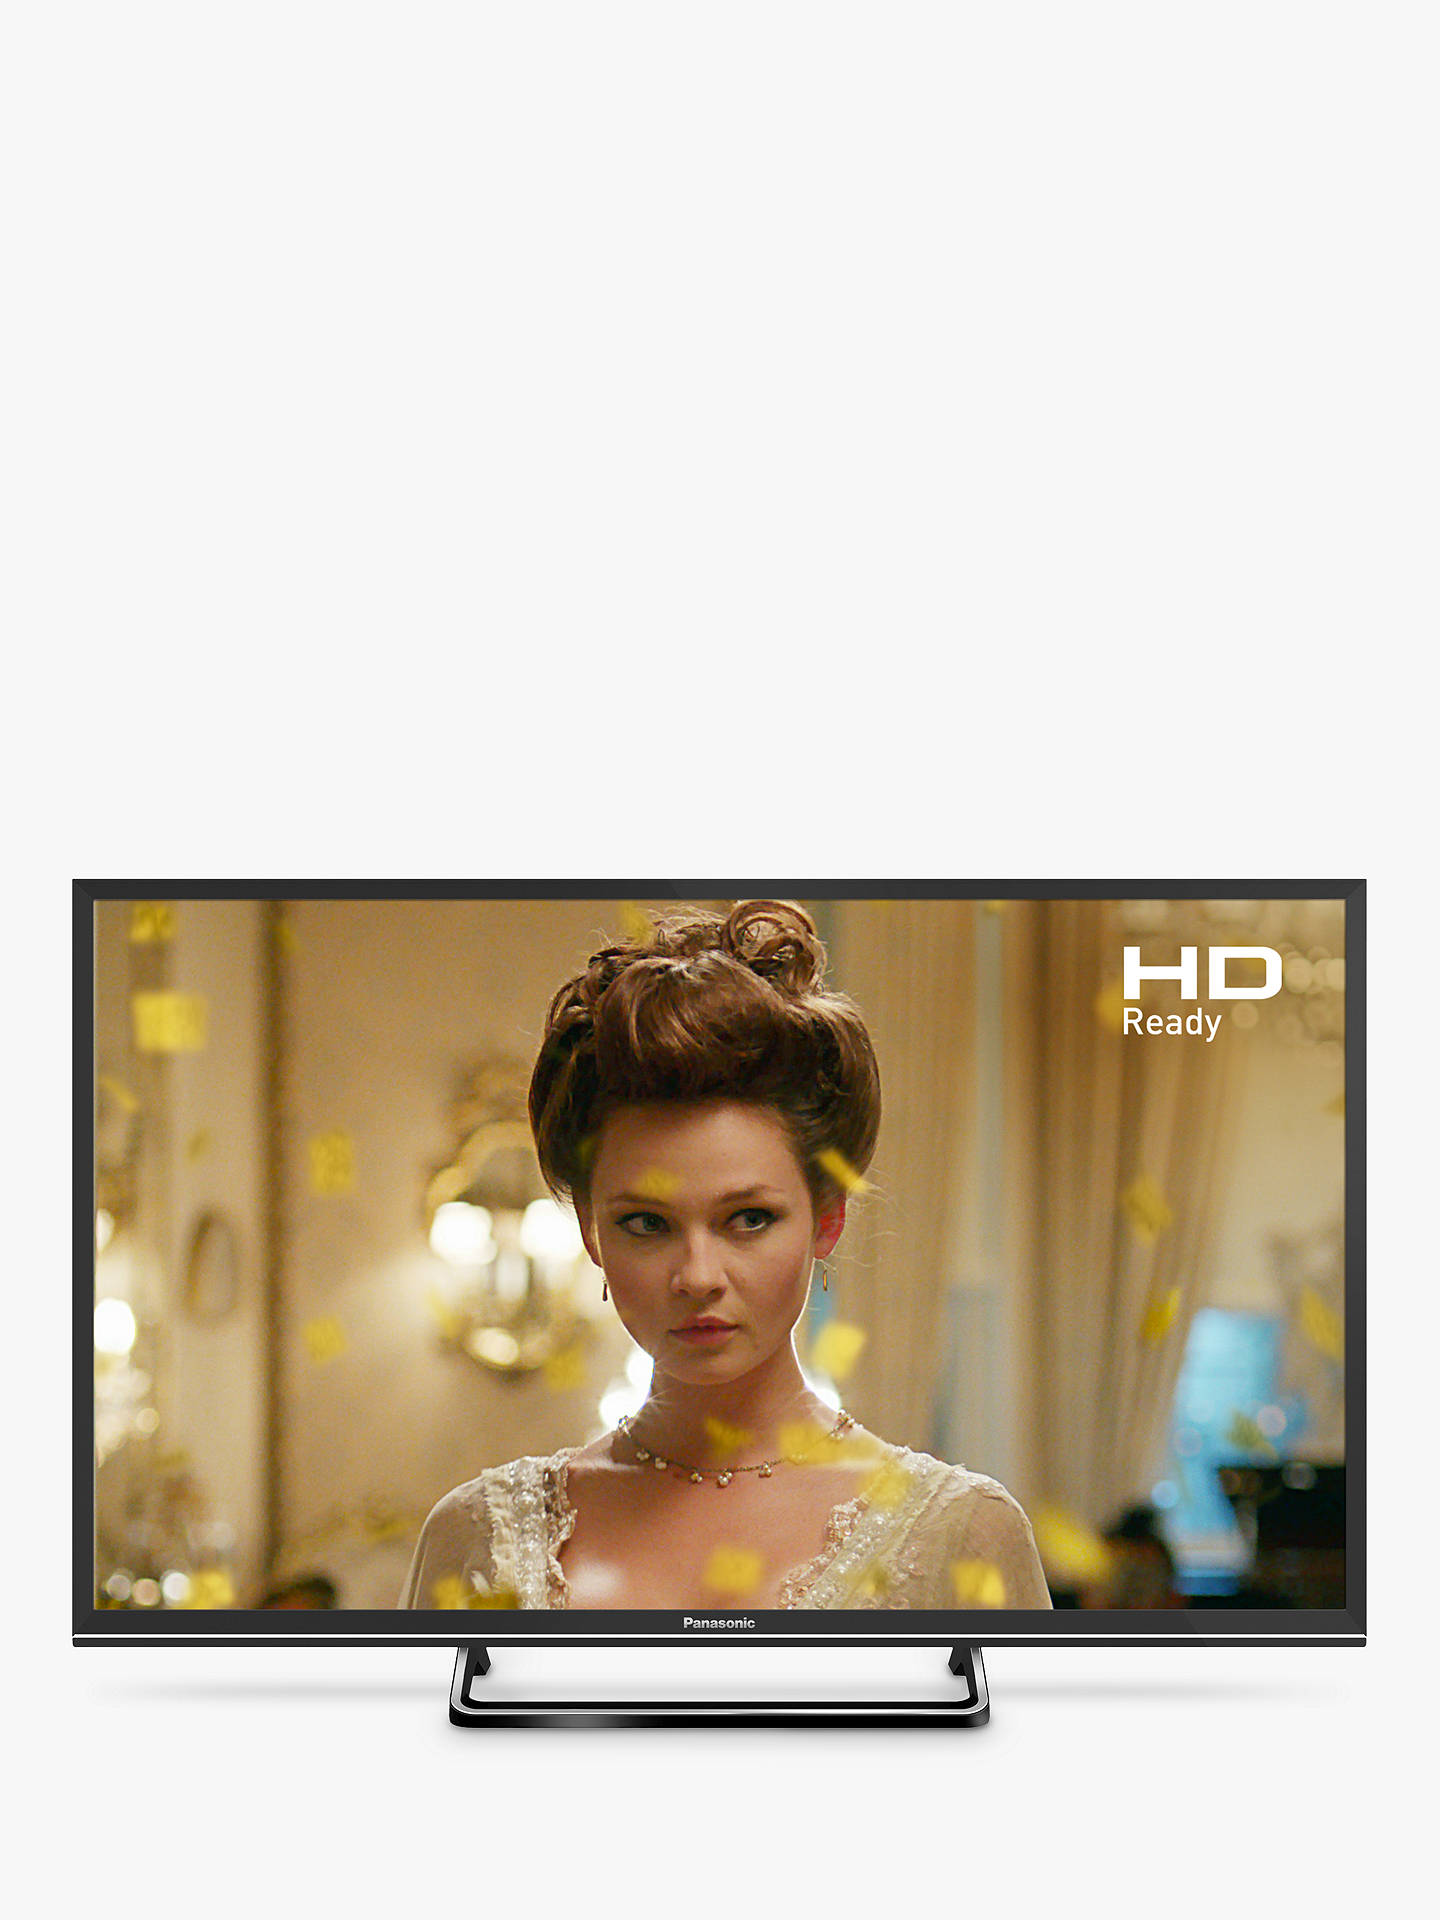 Panasonic TX-32FS503B LED HDR HD Ready 720p Smart TV, 32